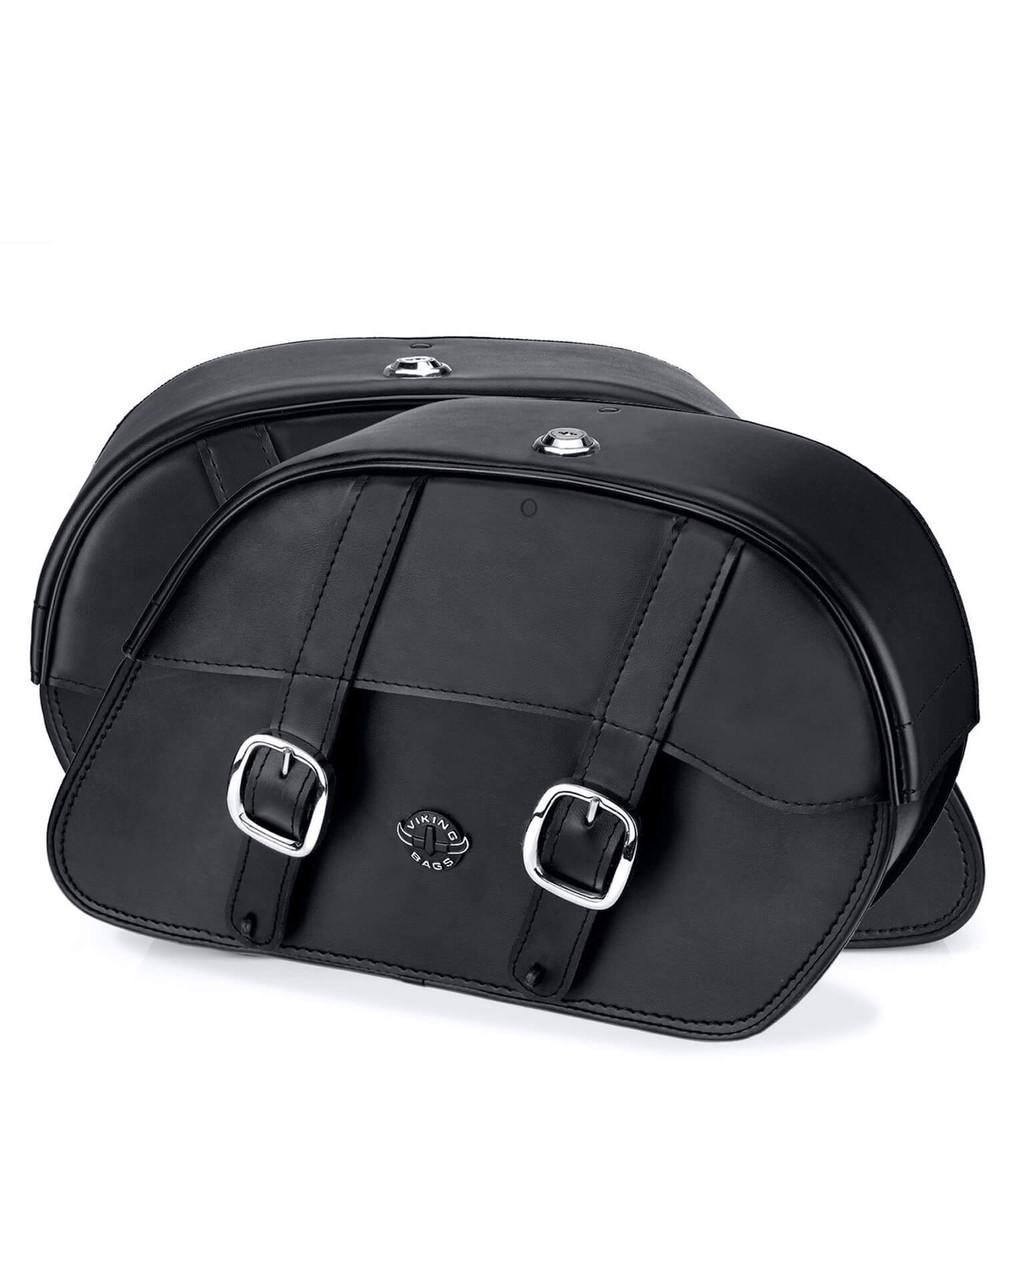 Honda VTX 1300 Retro Large Shock Cutout Slanted Motorcycle Saddlebags Both Bags View